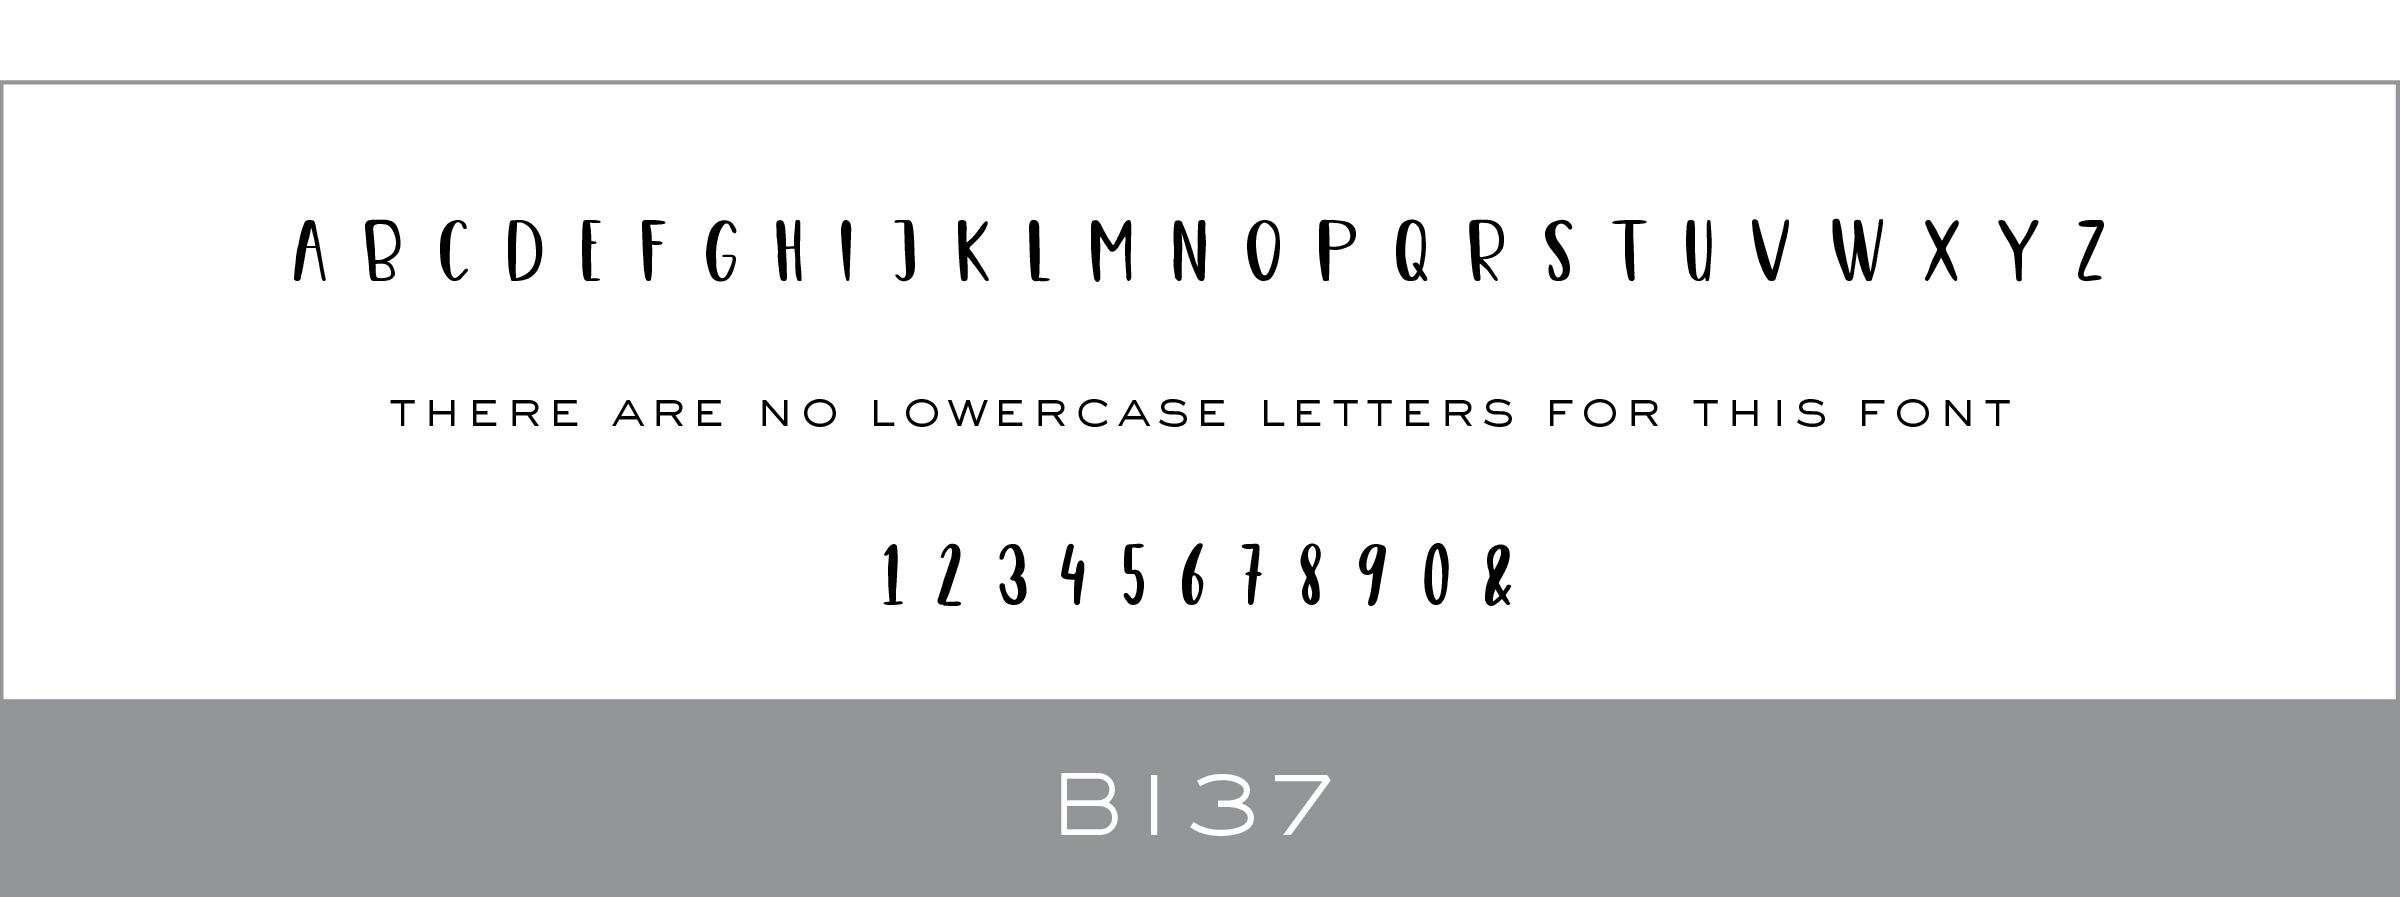 B137_Haute_Papier_Font.jpg